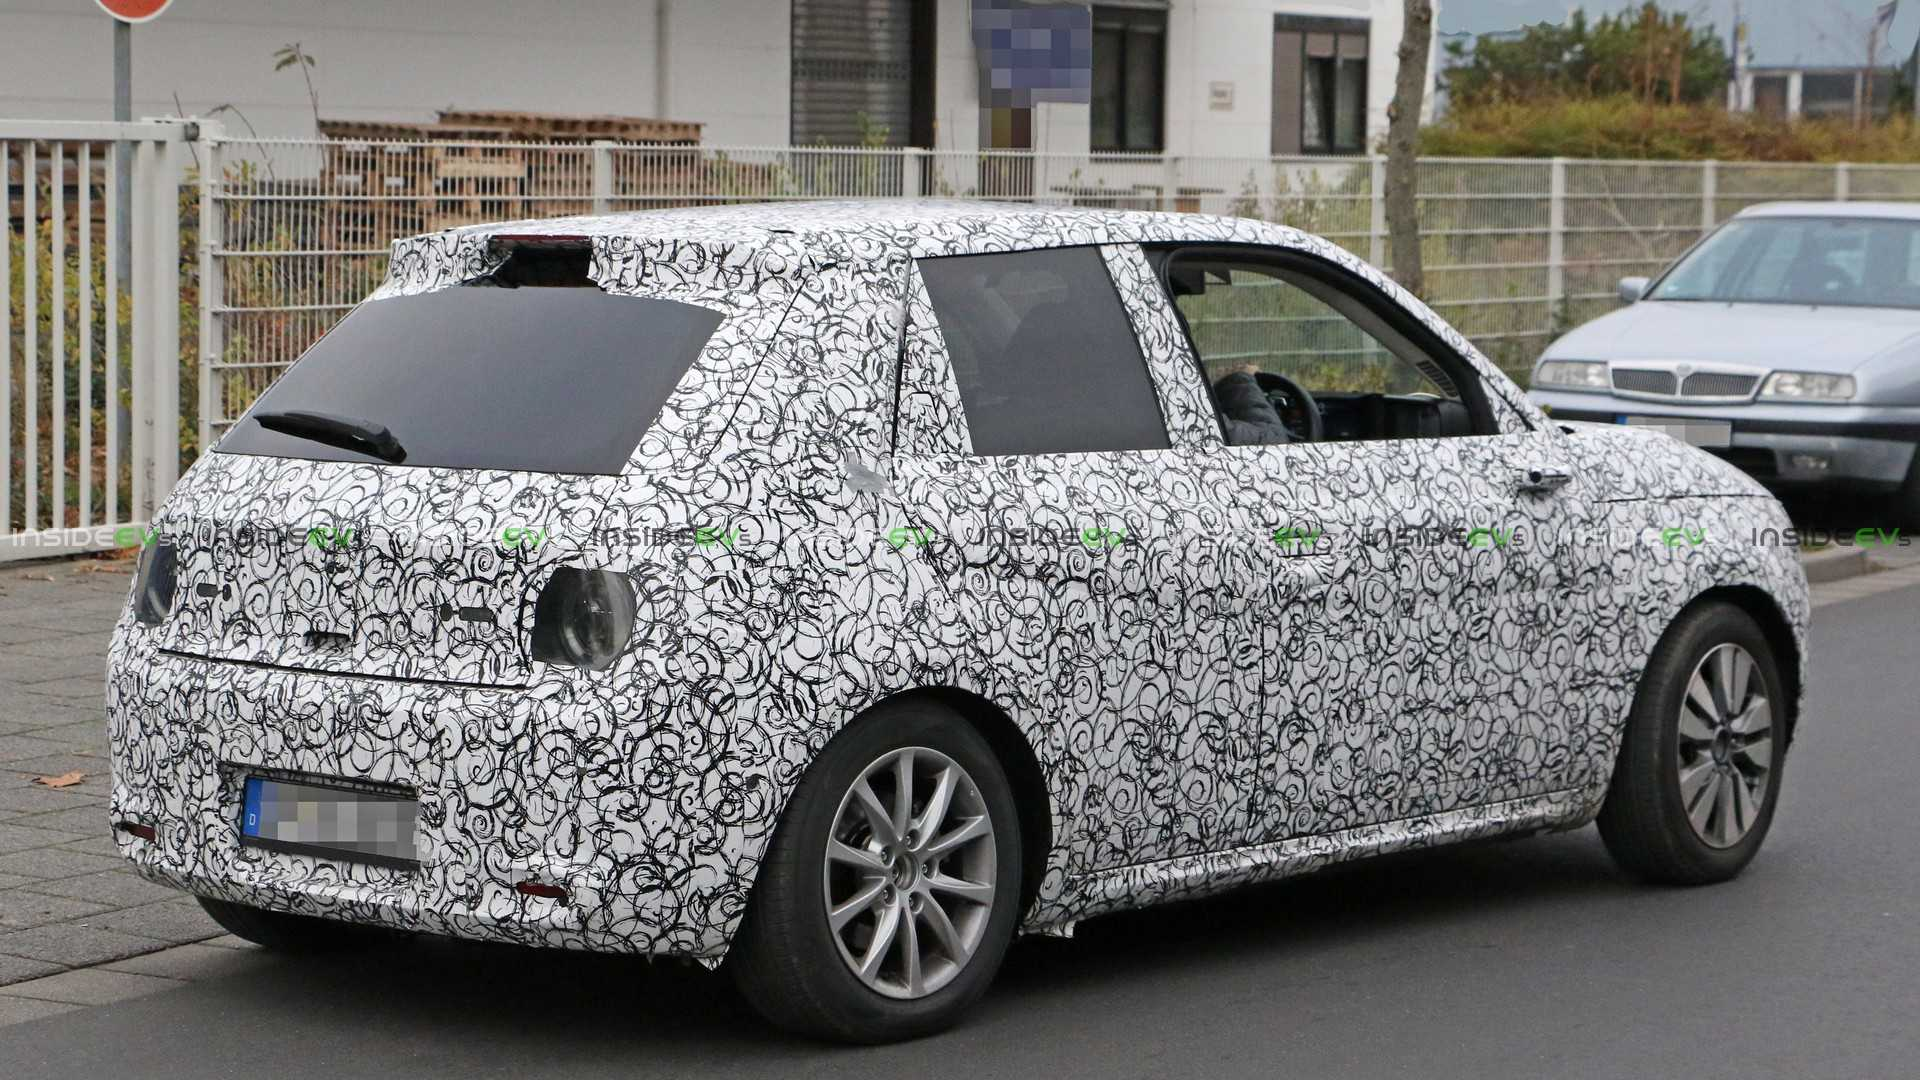 2020 Honda Urban Ev Is The Most Adorable Prototype We Ve Seen